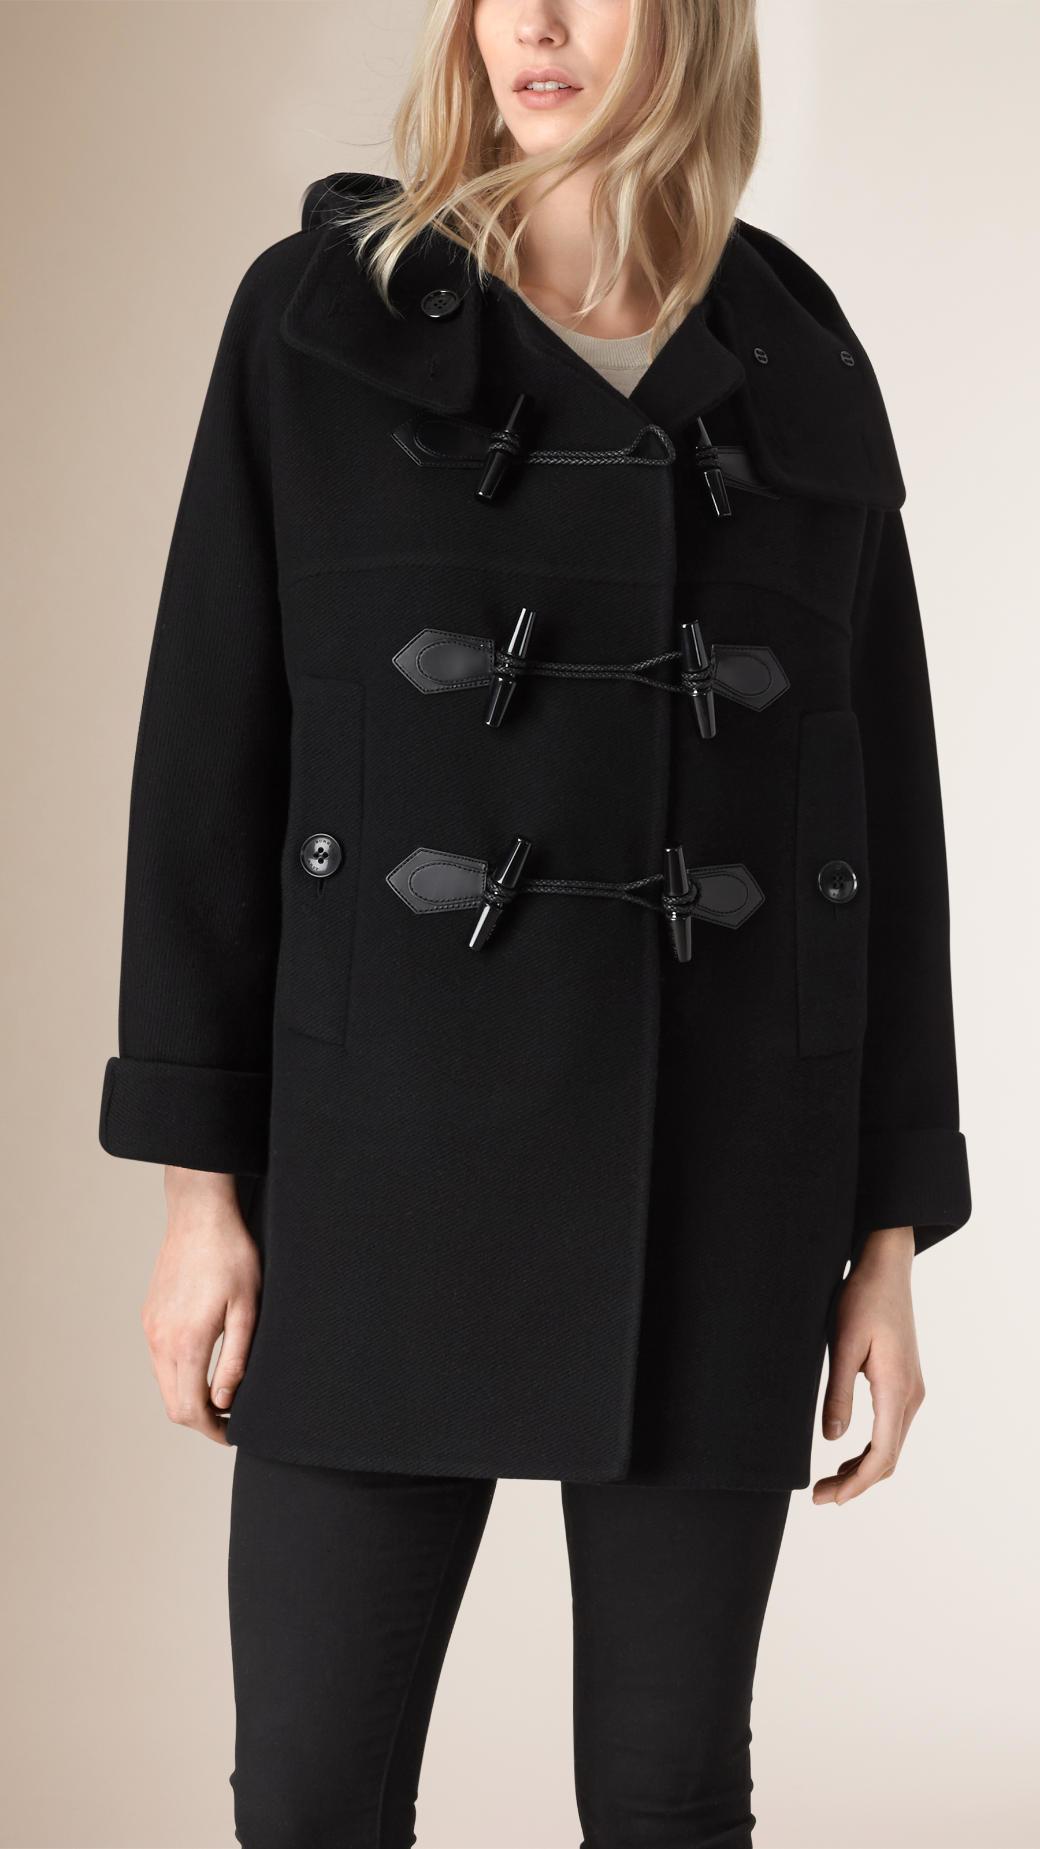 Burberry Oversize Virgin Wool Cashmere Duffle Coat Black in Black ...